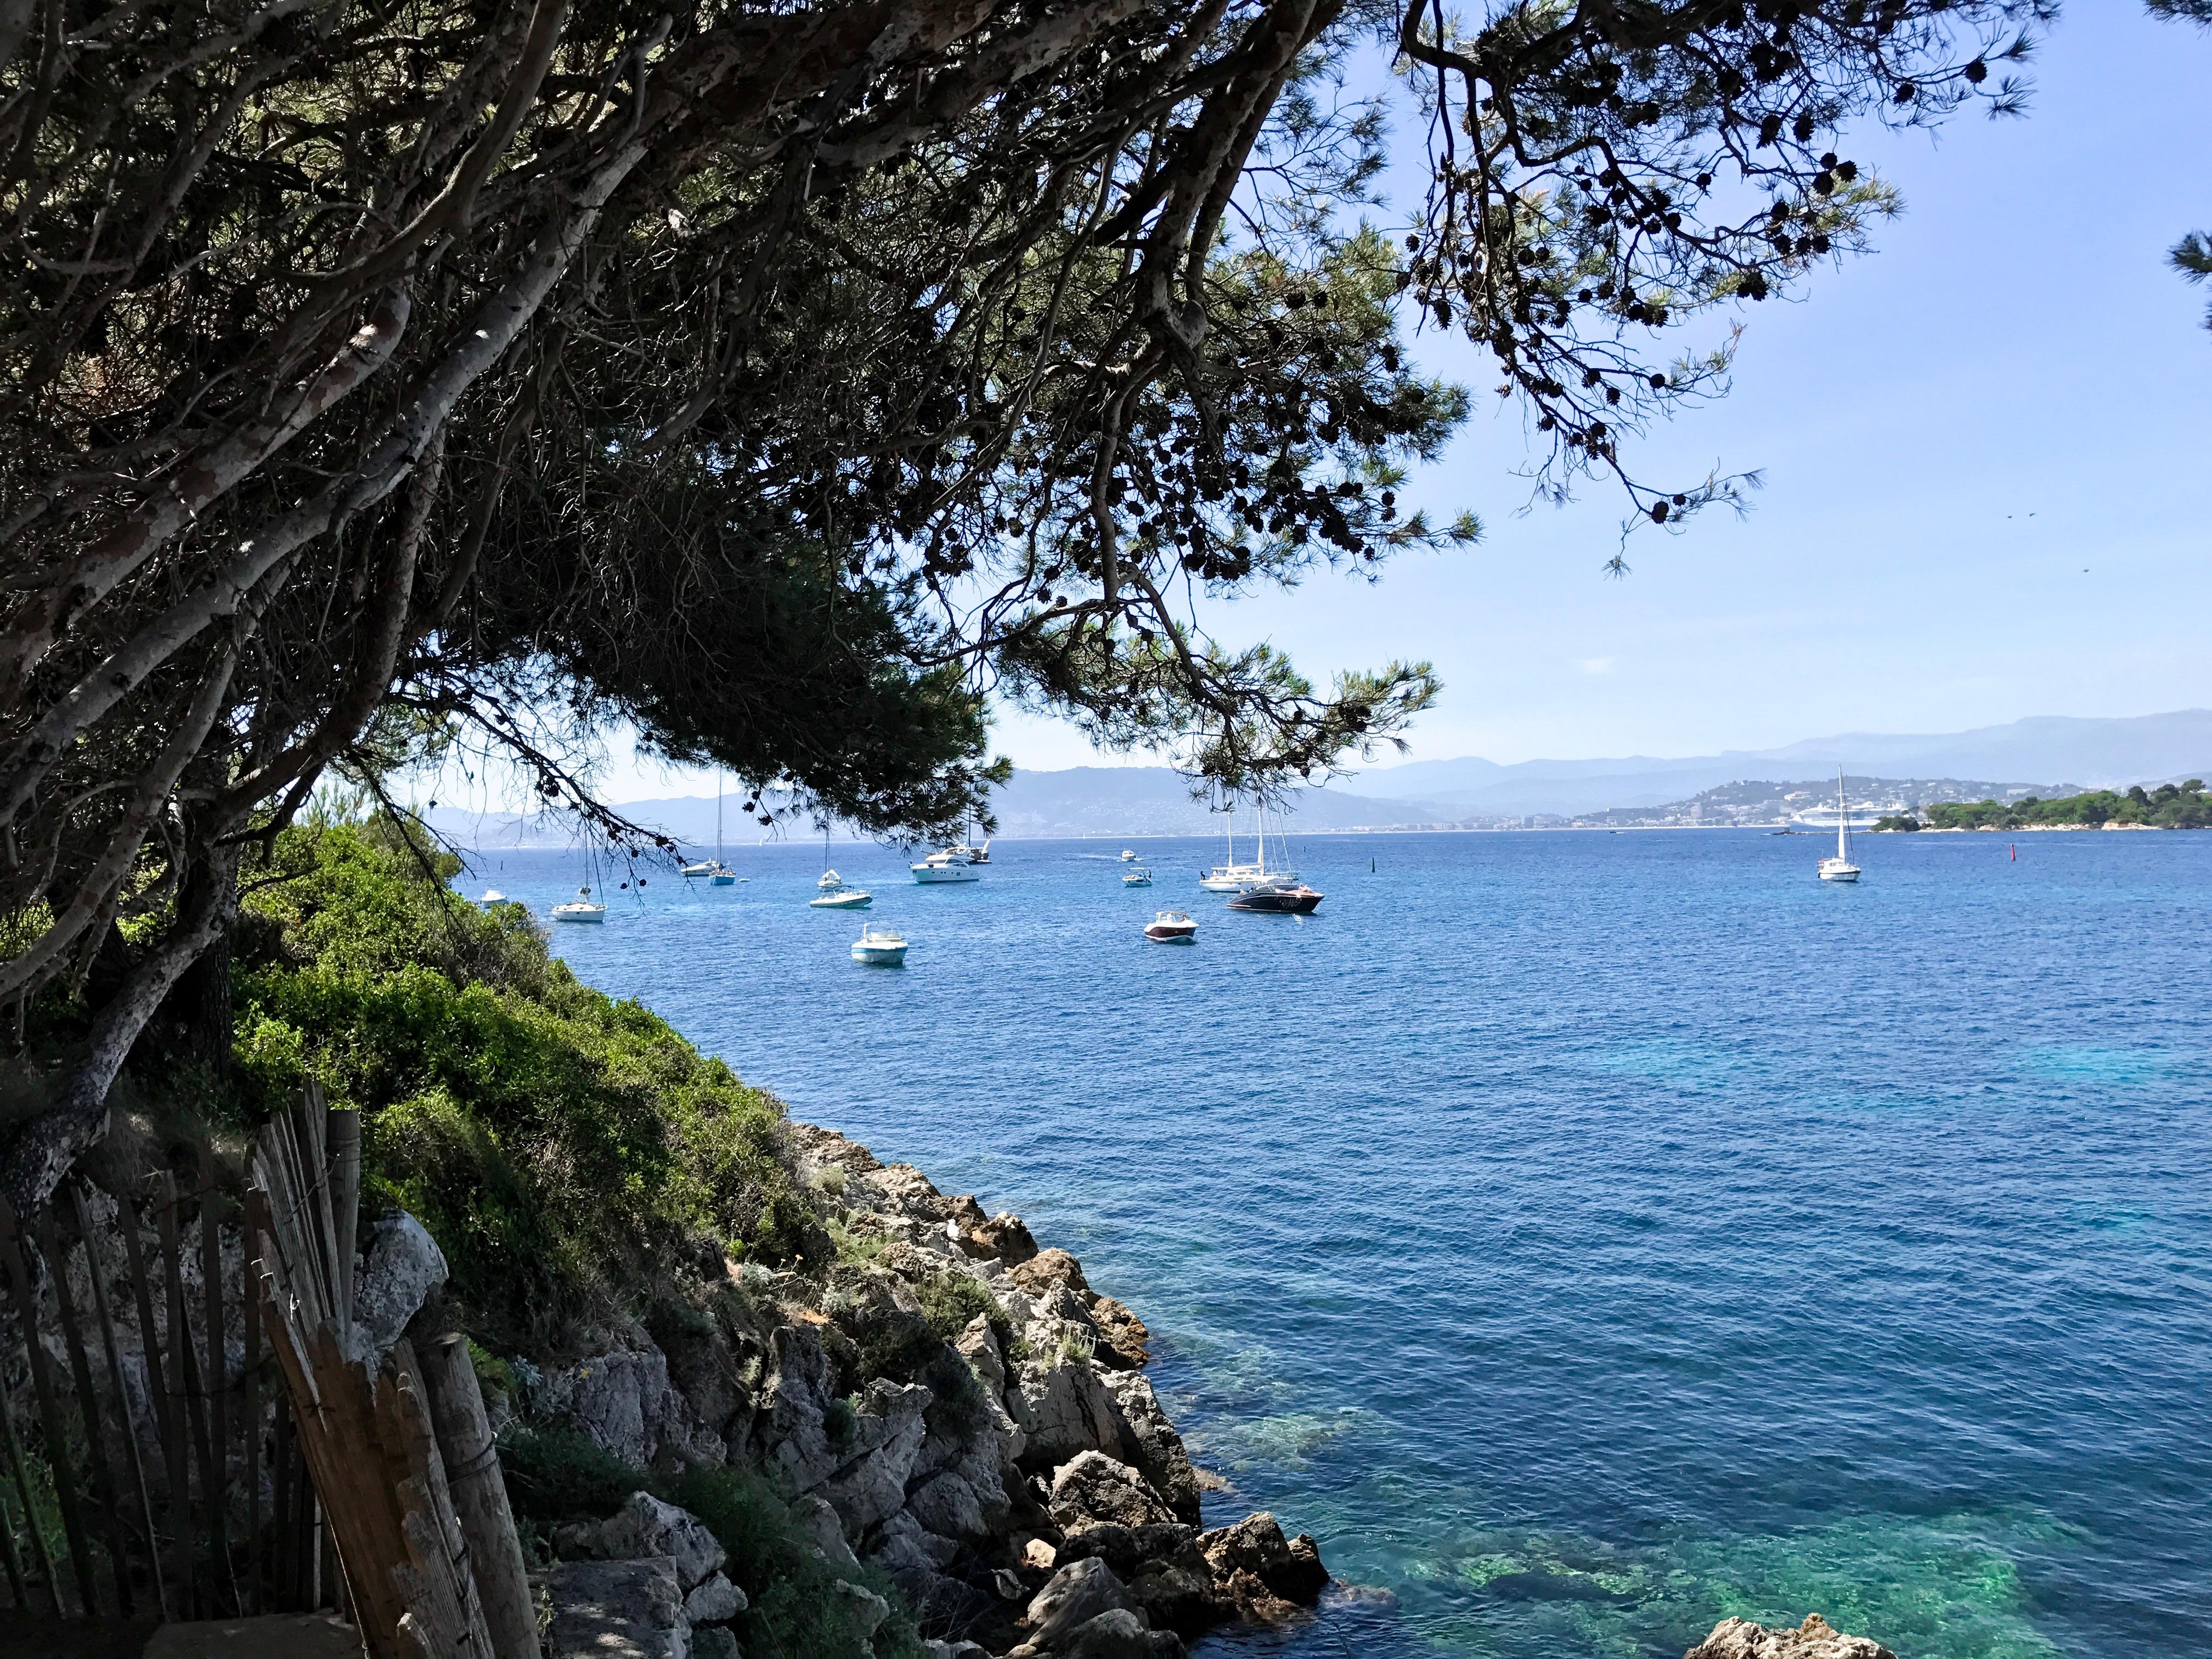 Uitzicht vanaf Île Saint-Honorat